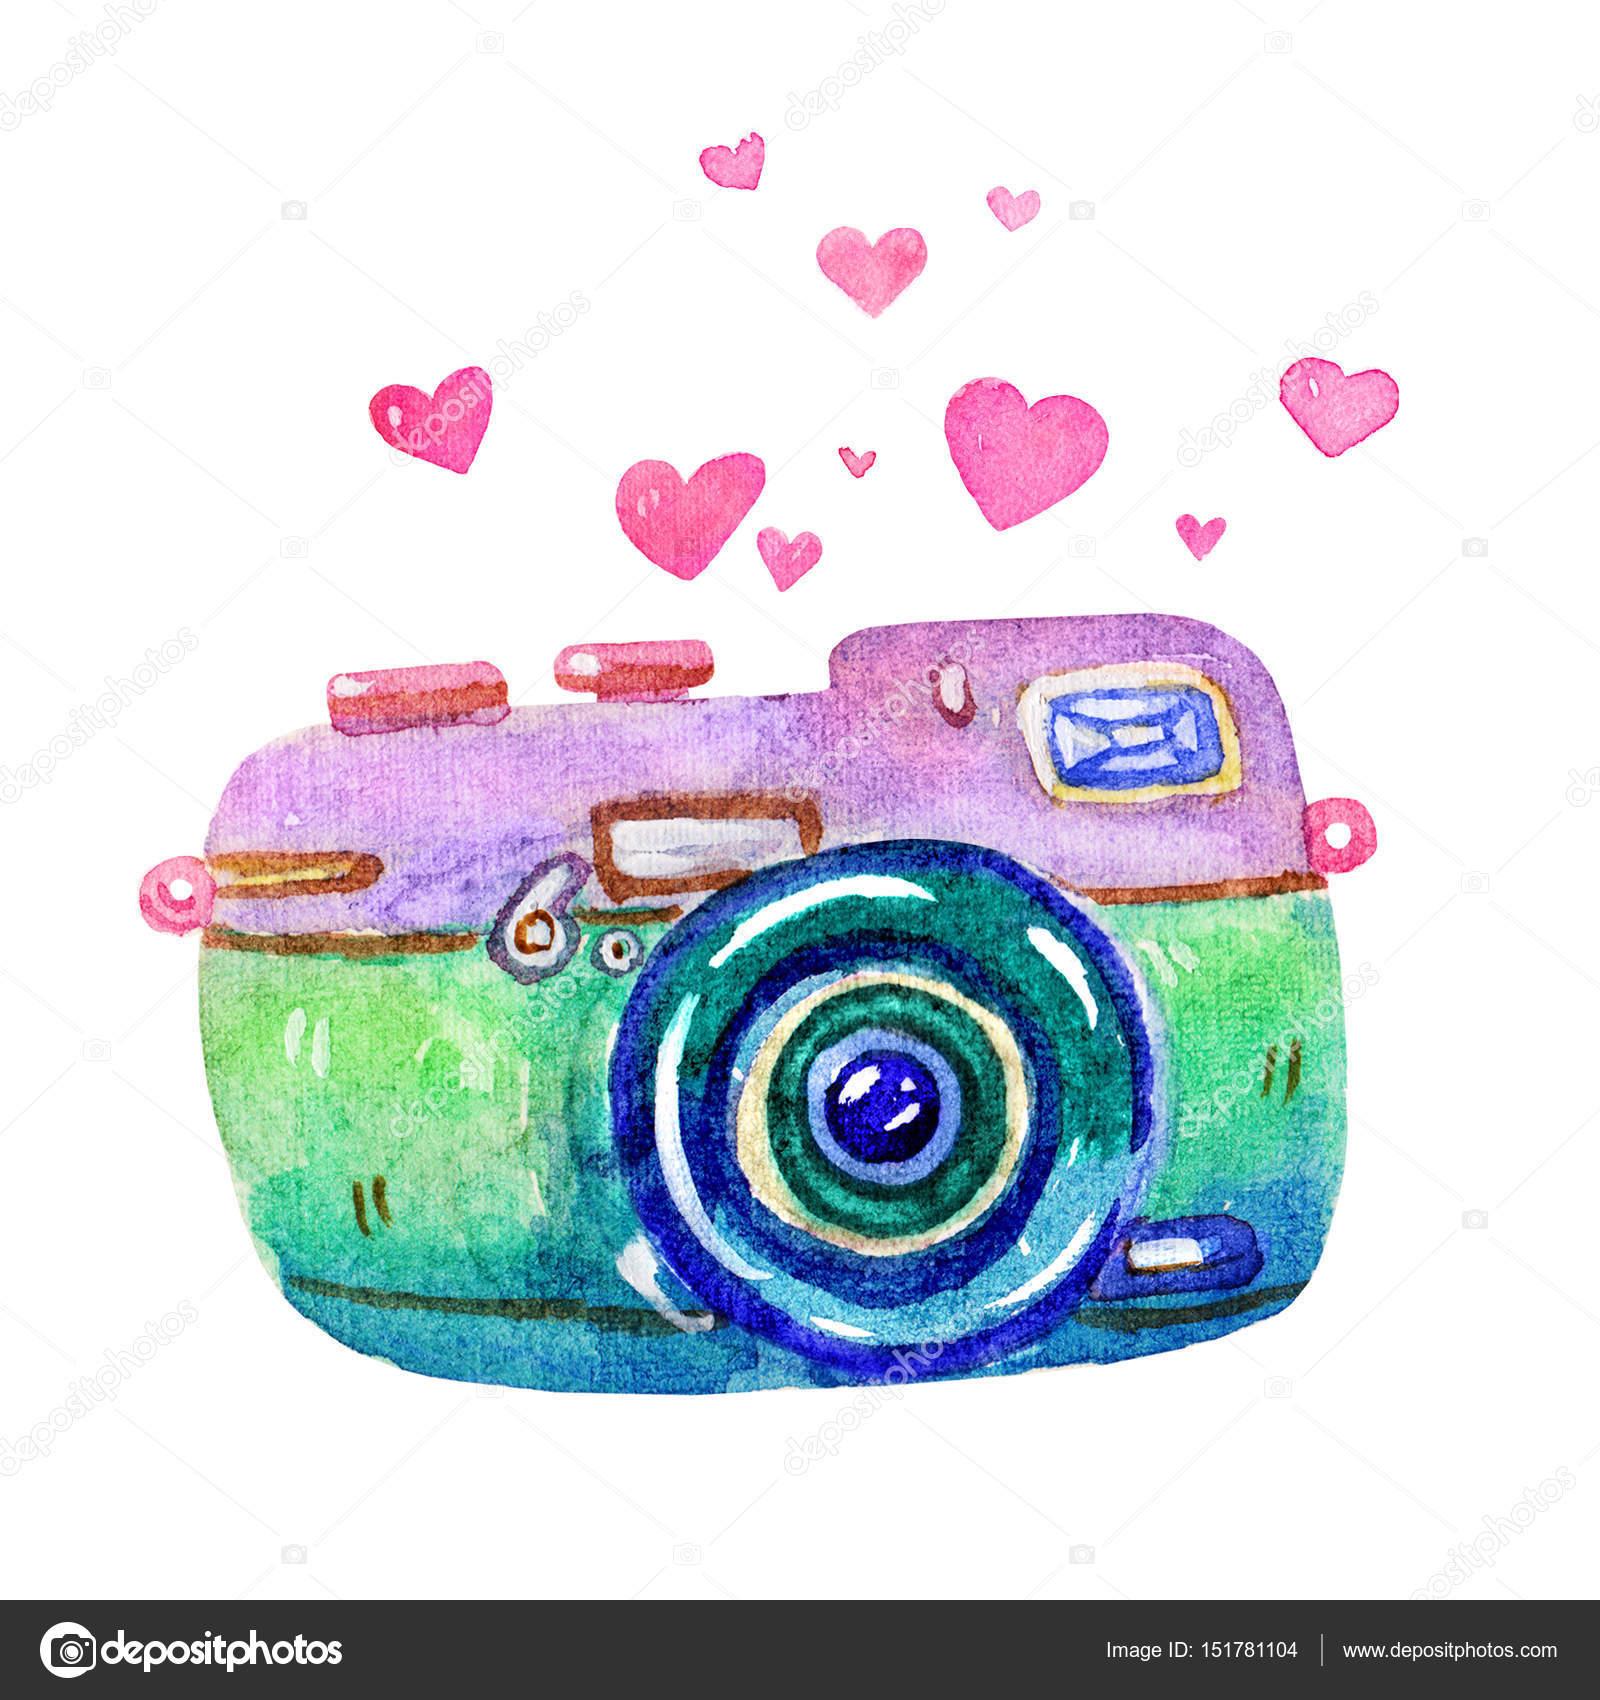 Cartoon Watercolor Vintage Photo Camera Illustration Isolated On White BackgroundRetro Film CameraPassion For PhotographyWatercolor Illustrationclip Art